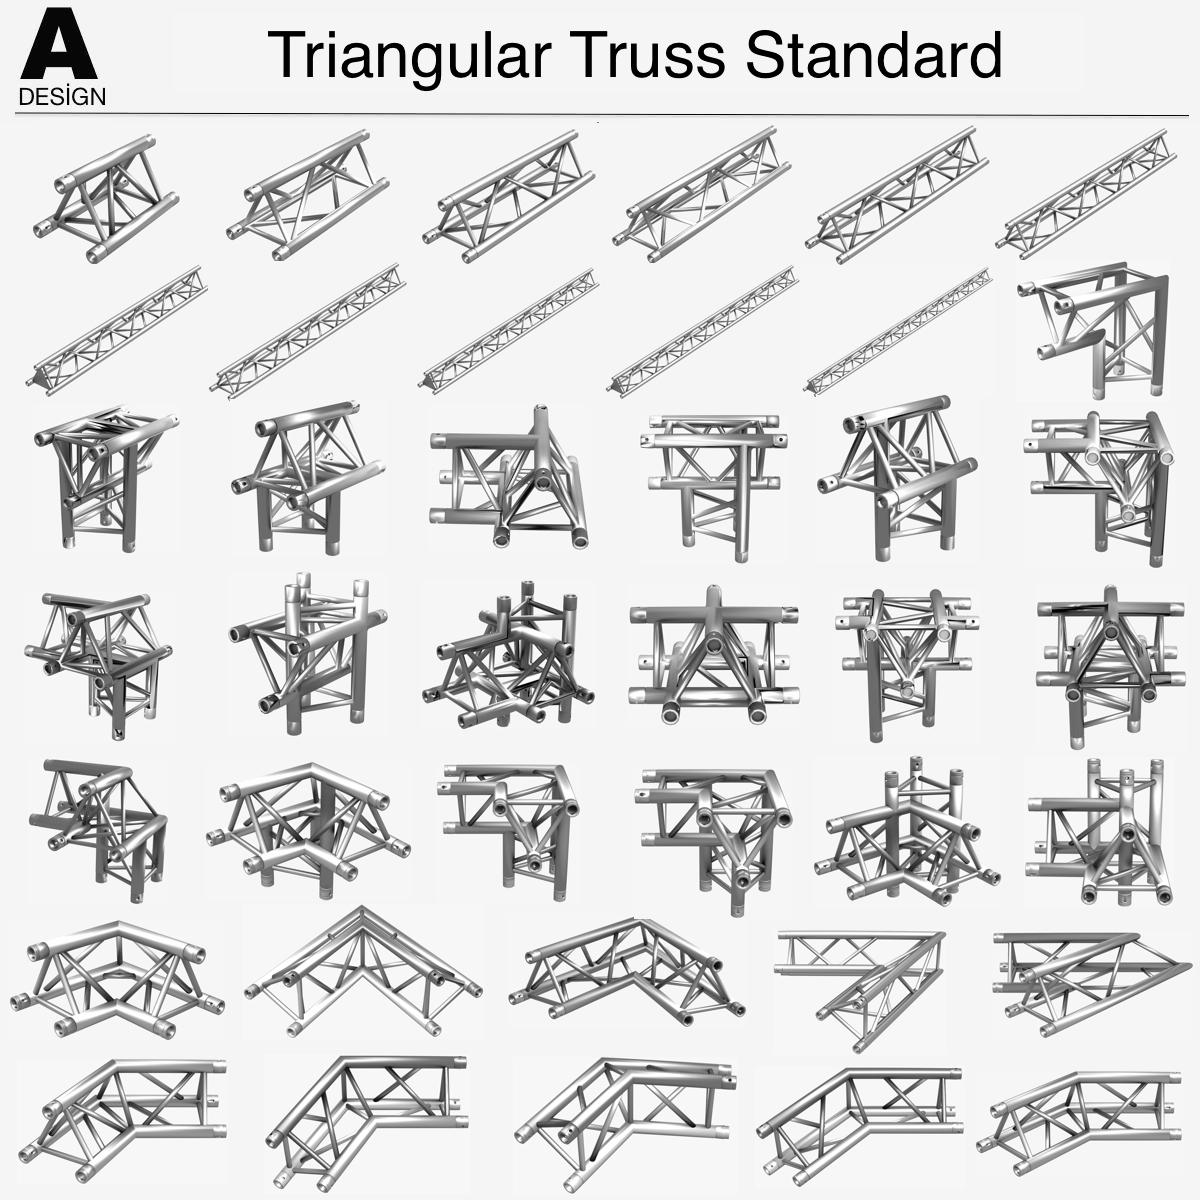 triangular trusses (collection 55 modular pieces) 3d model 3ds max dxf fbx c4d dae texture obj 216211